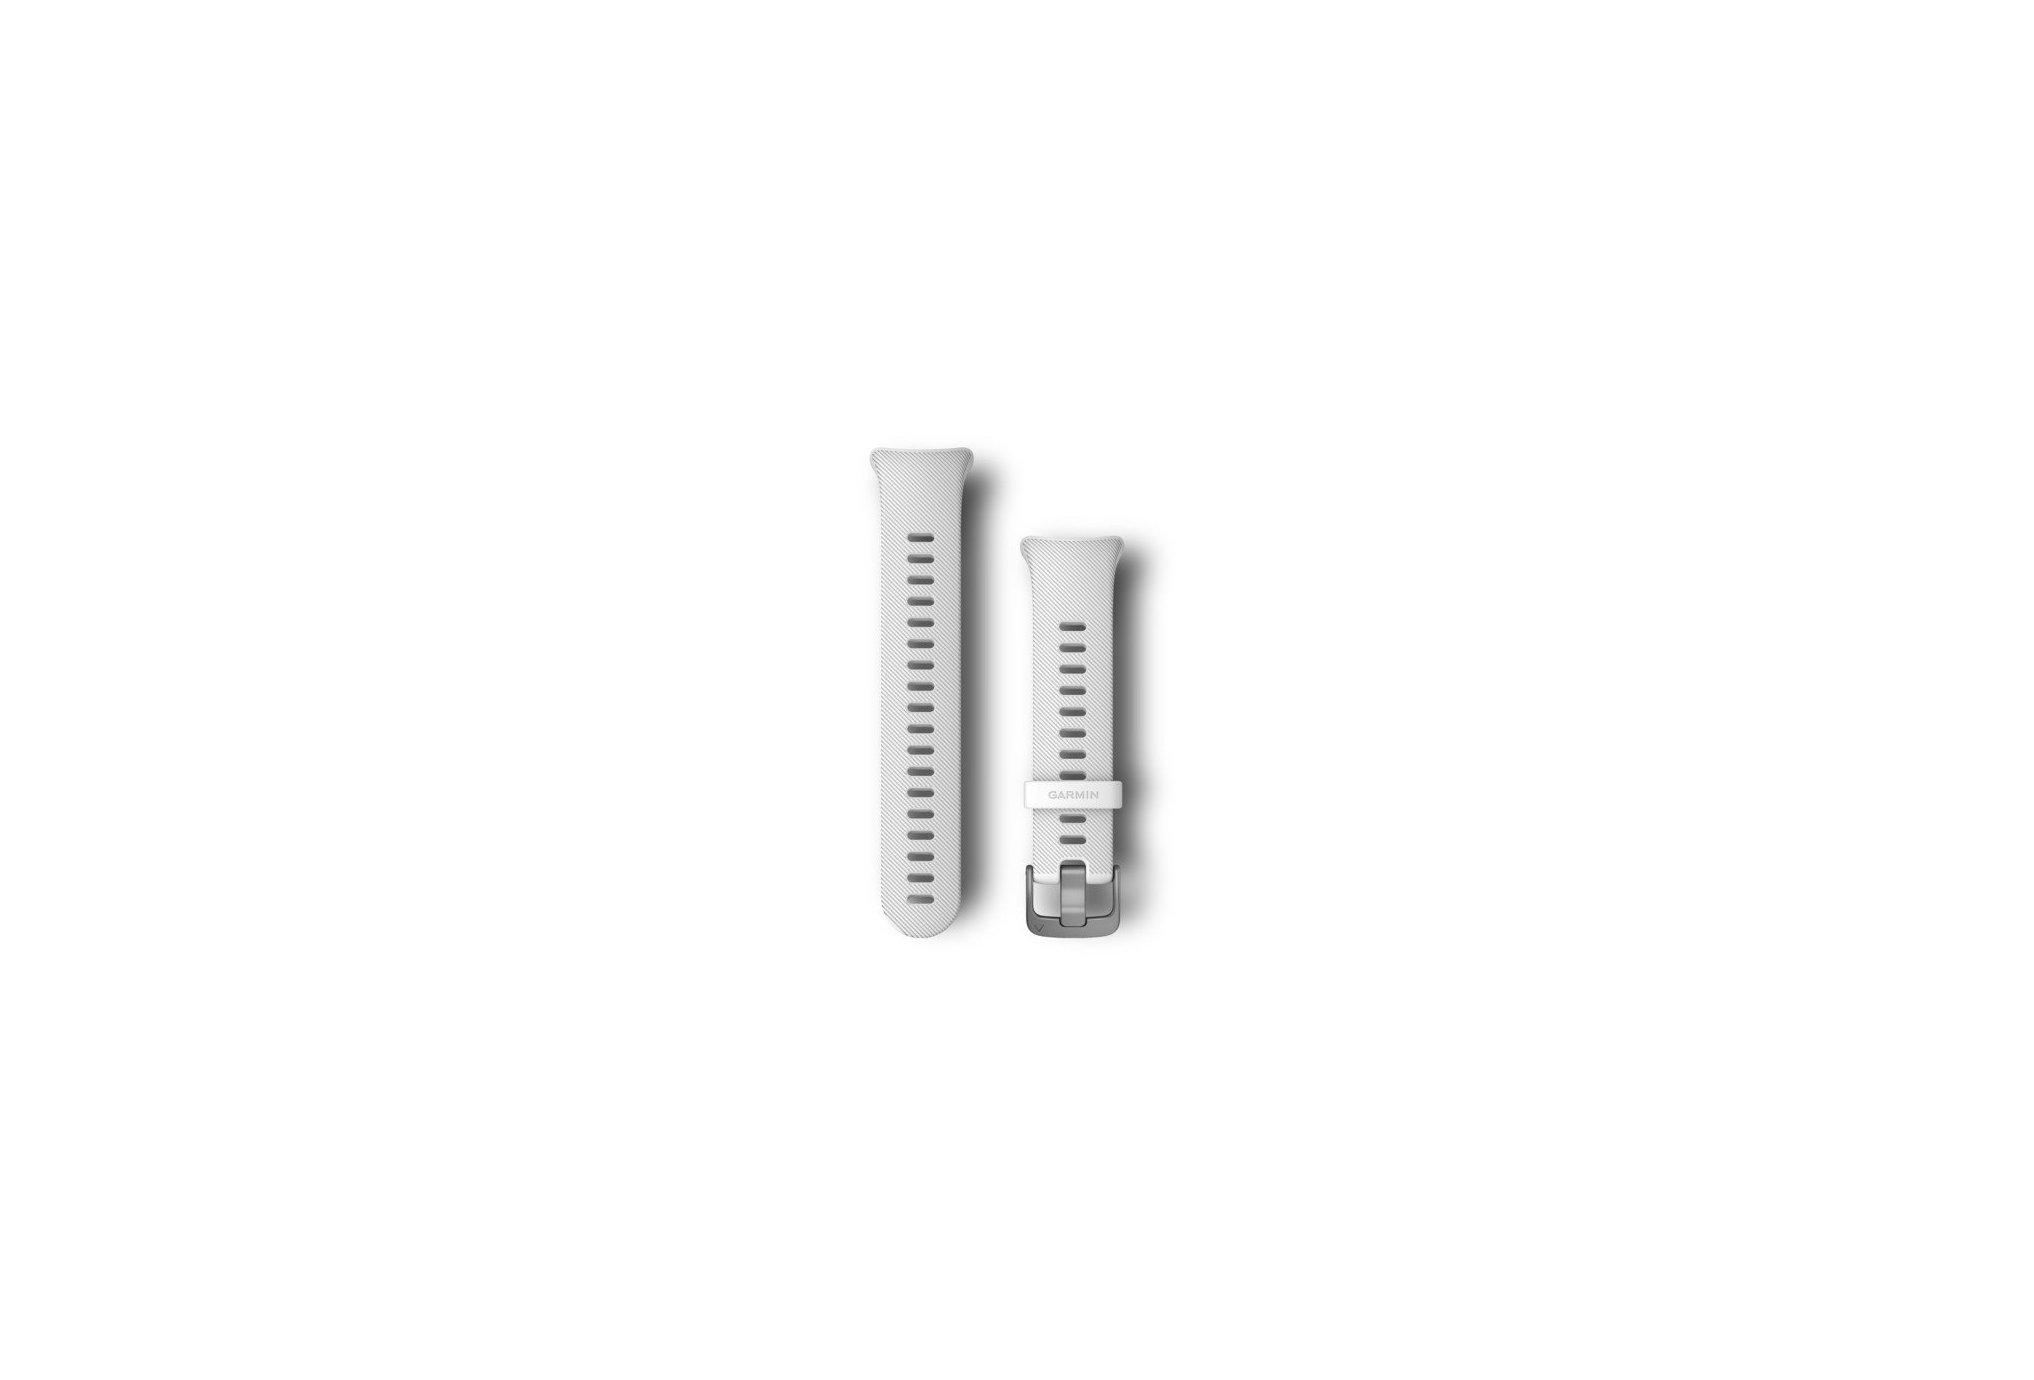 Garmin Bracelet de rechange Forerunner 45S - Small Accessoires montres/ Bracelets